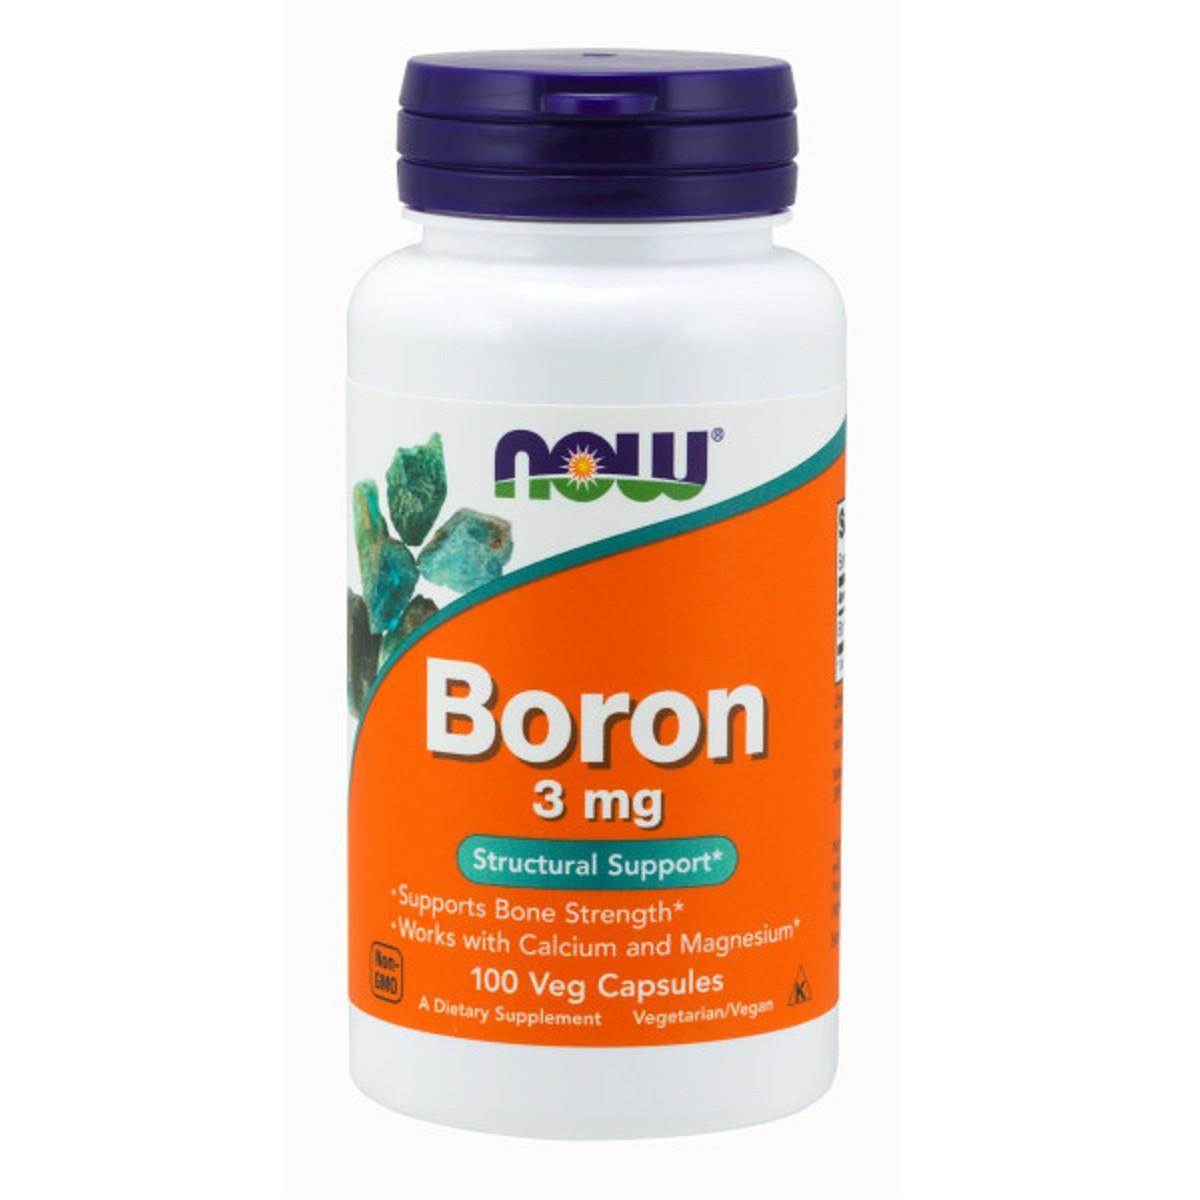 Бор, 3 мг, Boron 3 mg, Now Foods, 100 вегетарианских капсул